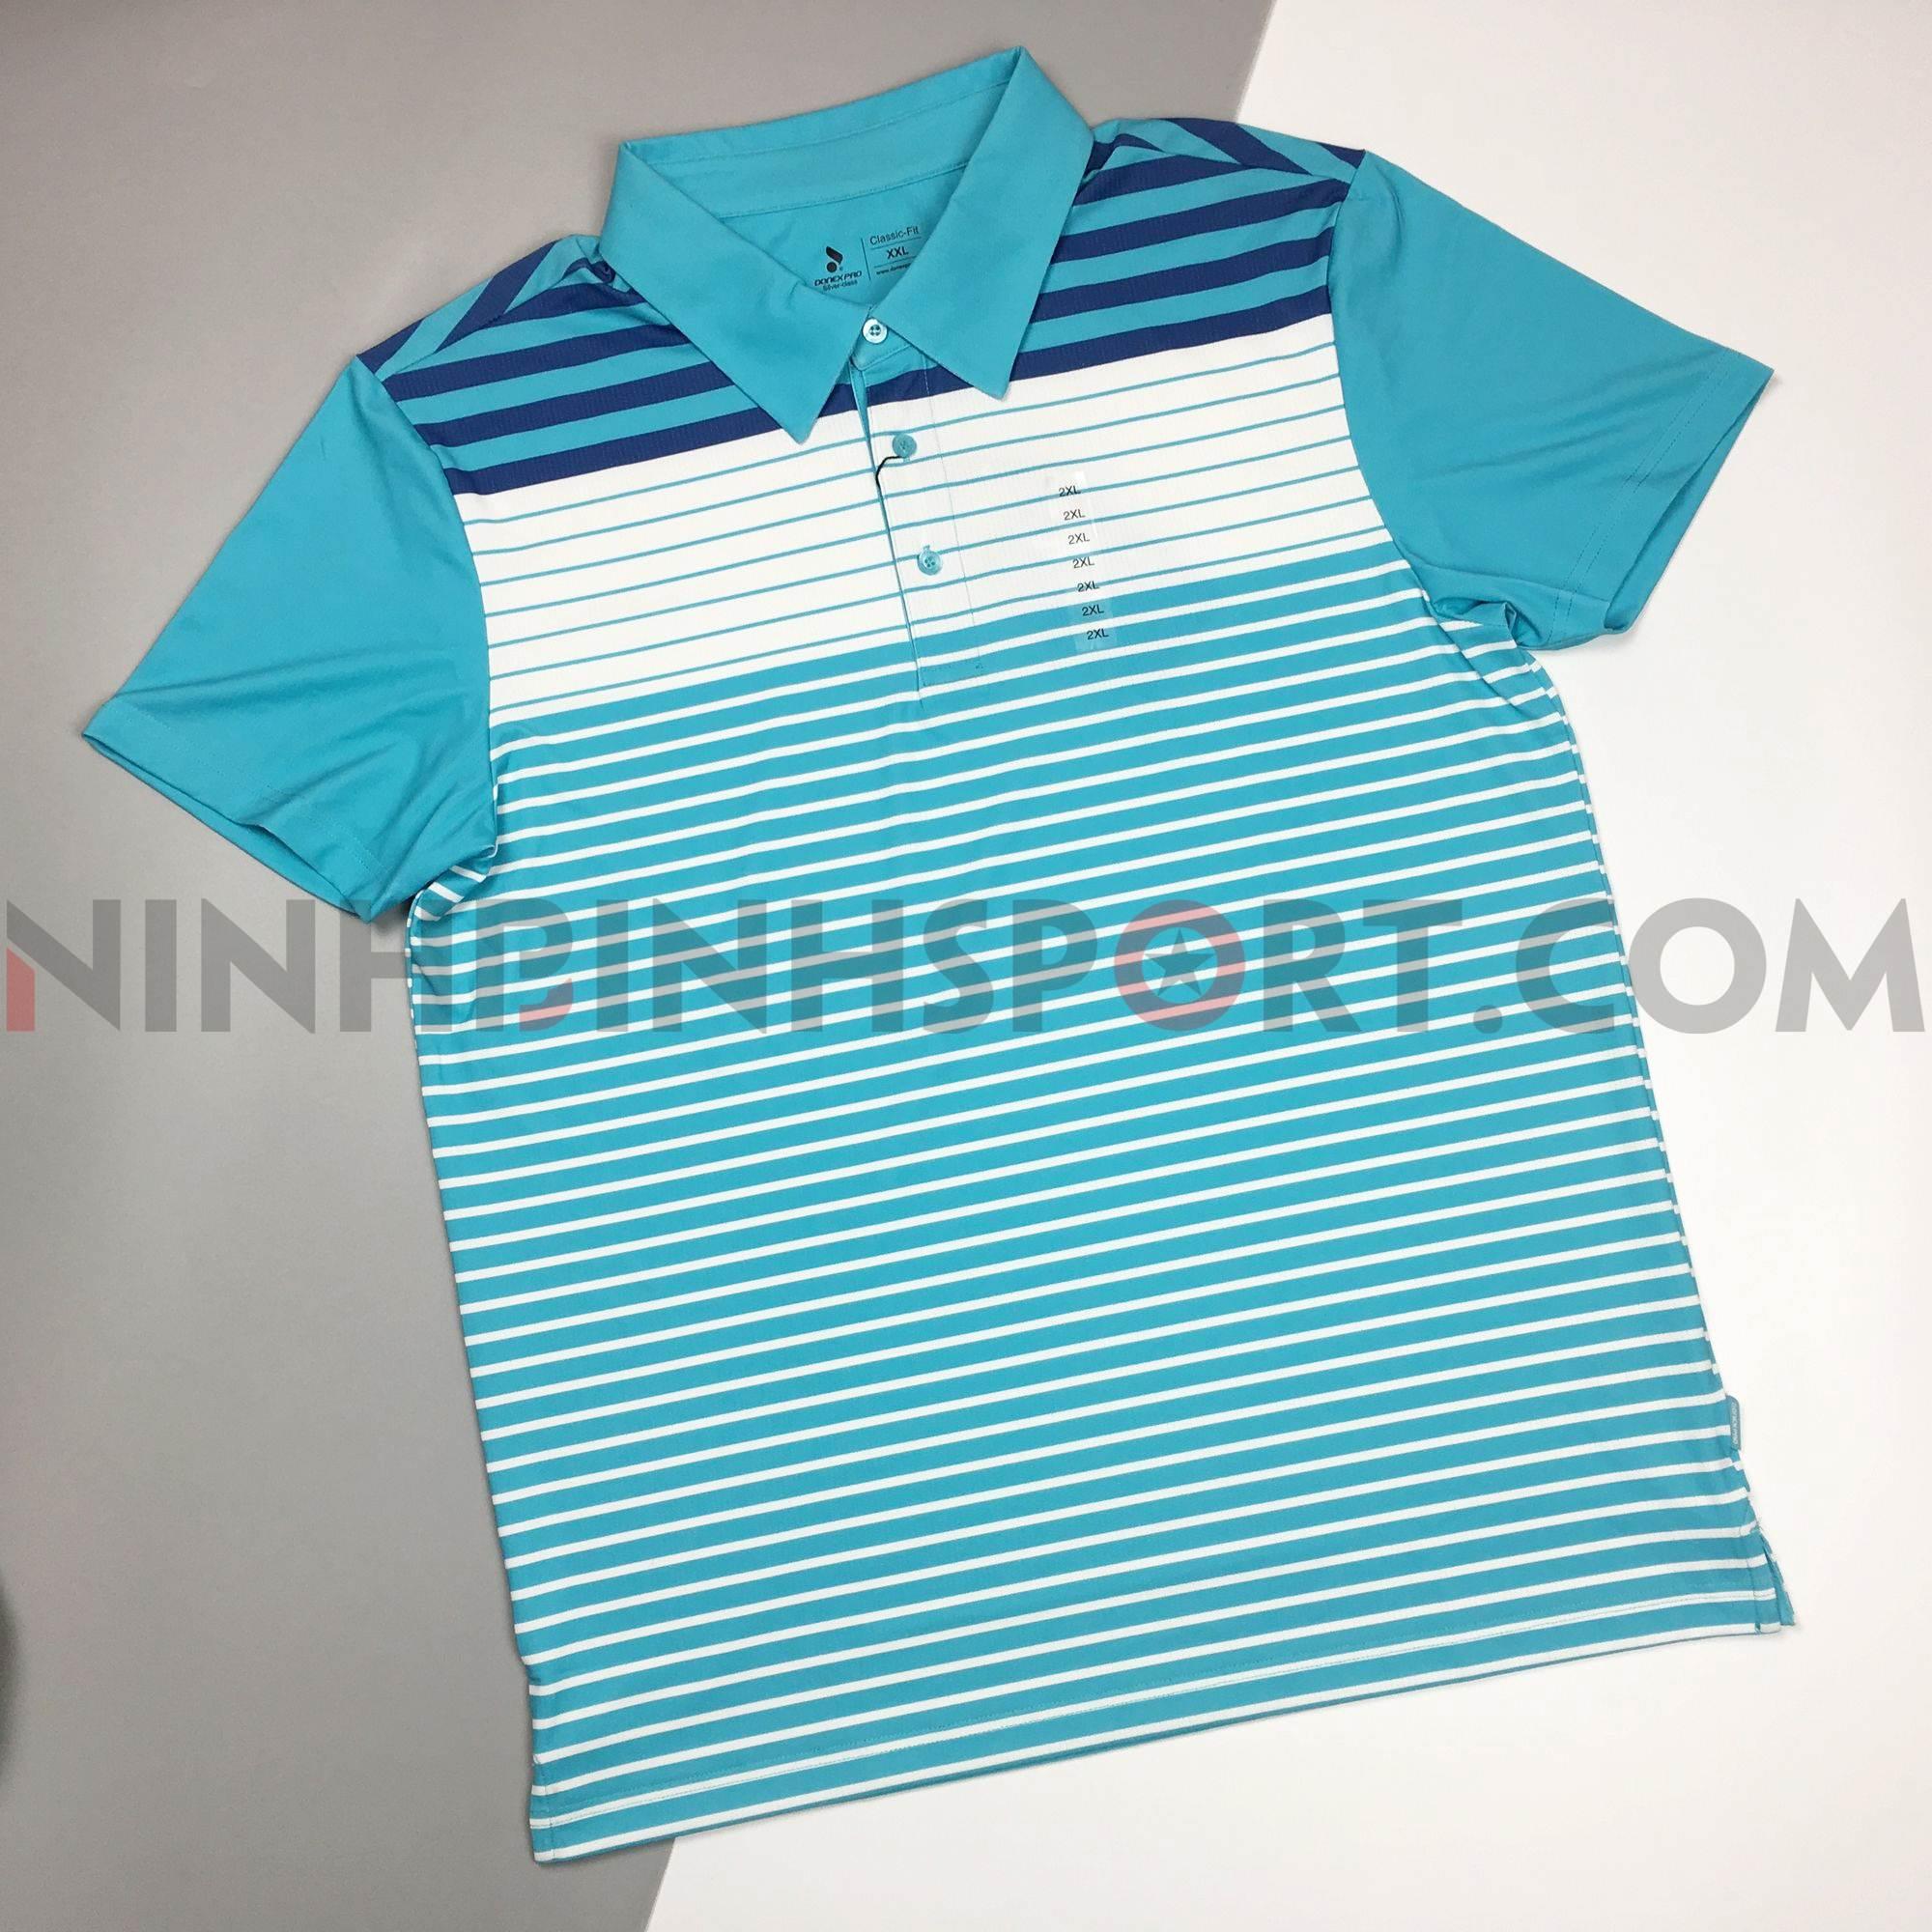 Áo thể thao nam Donex Golf Polo MC-9014-19-19